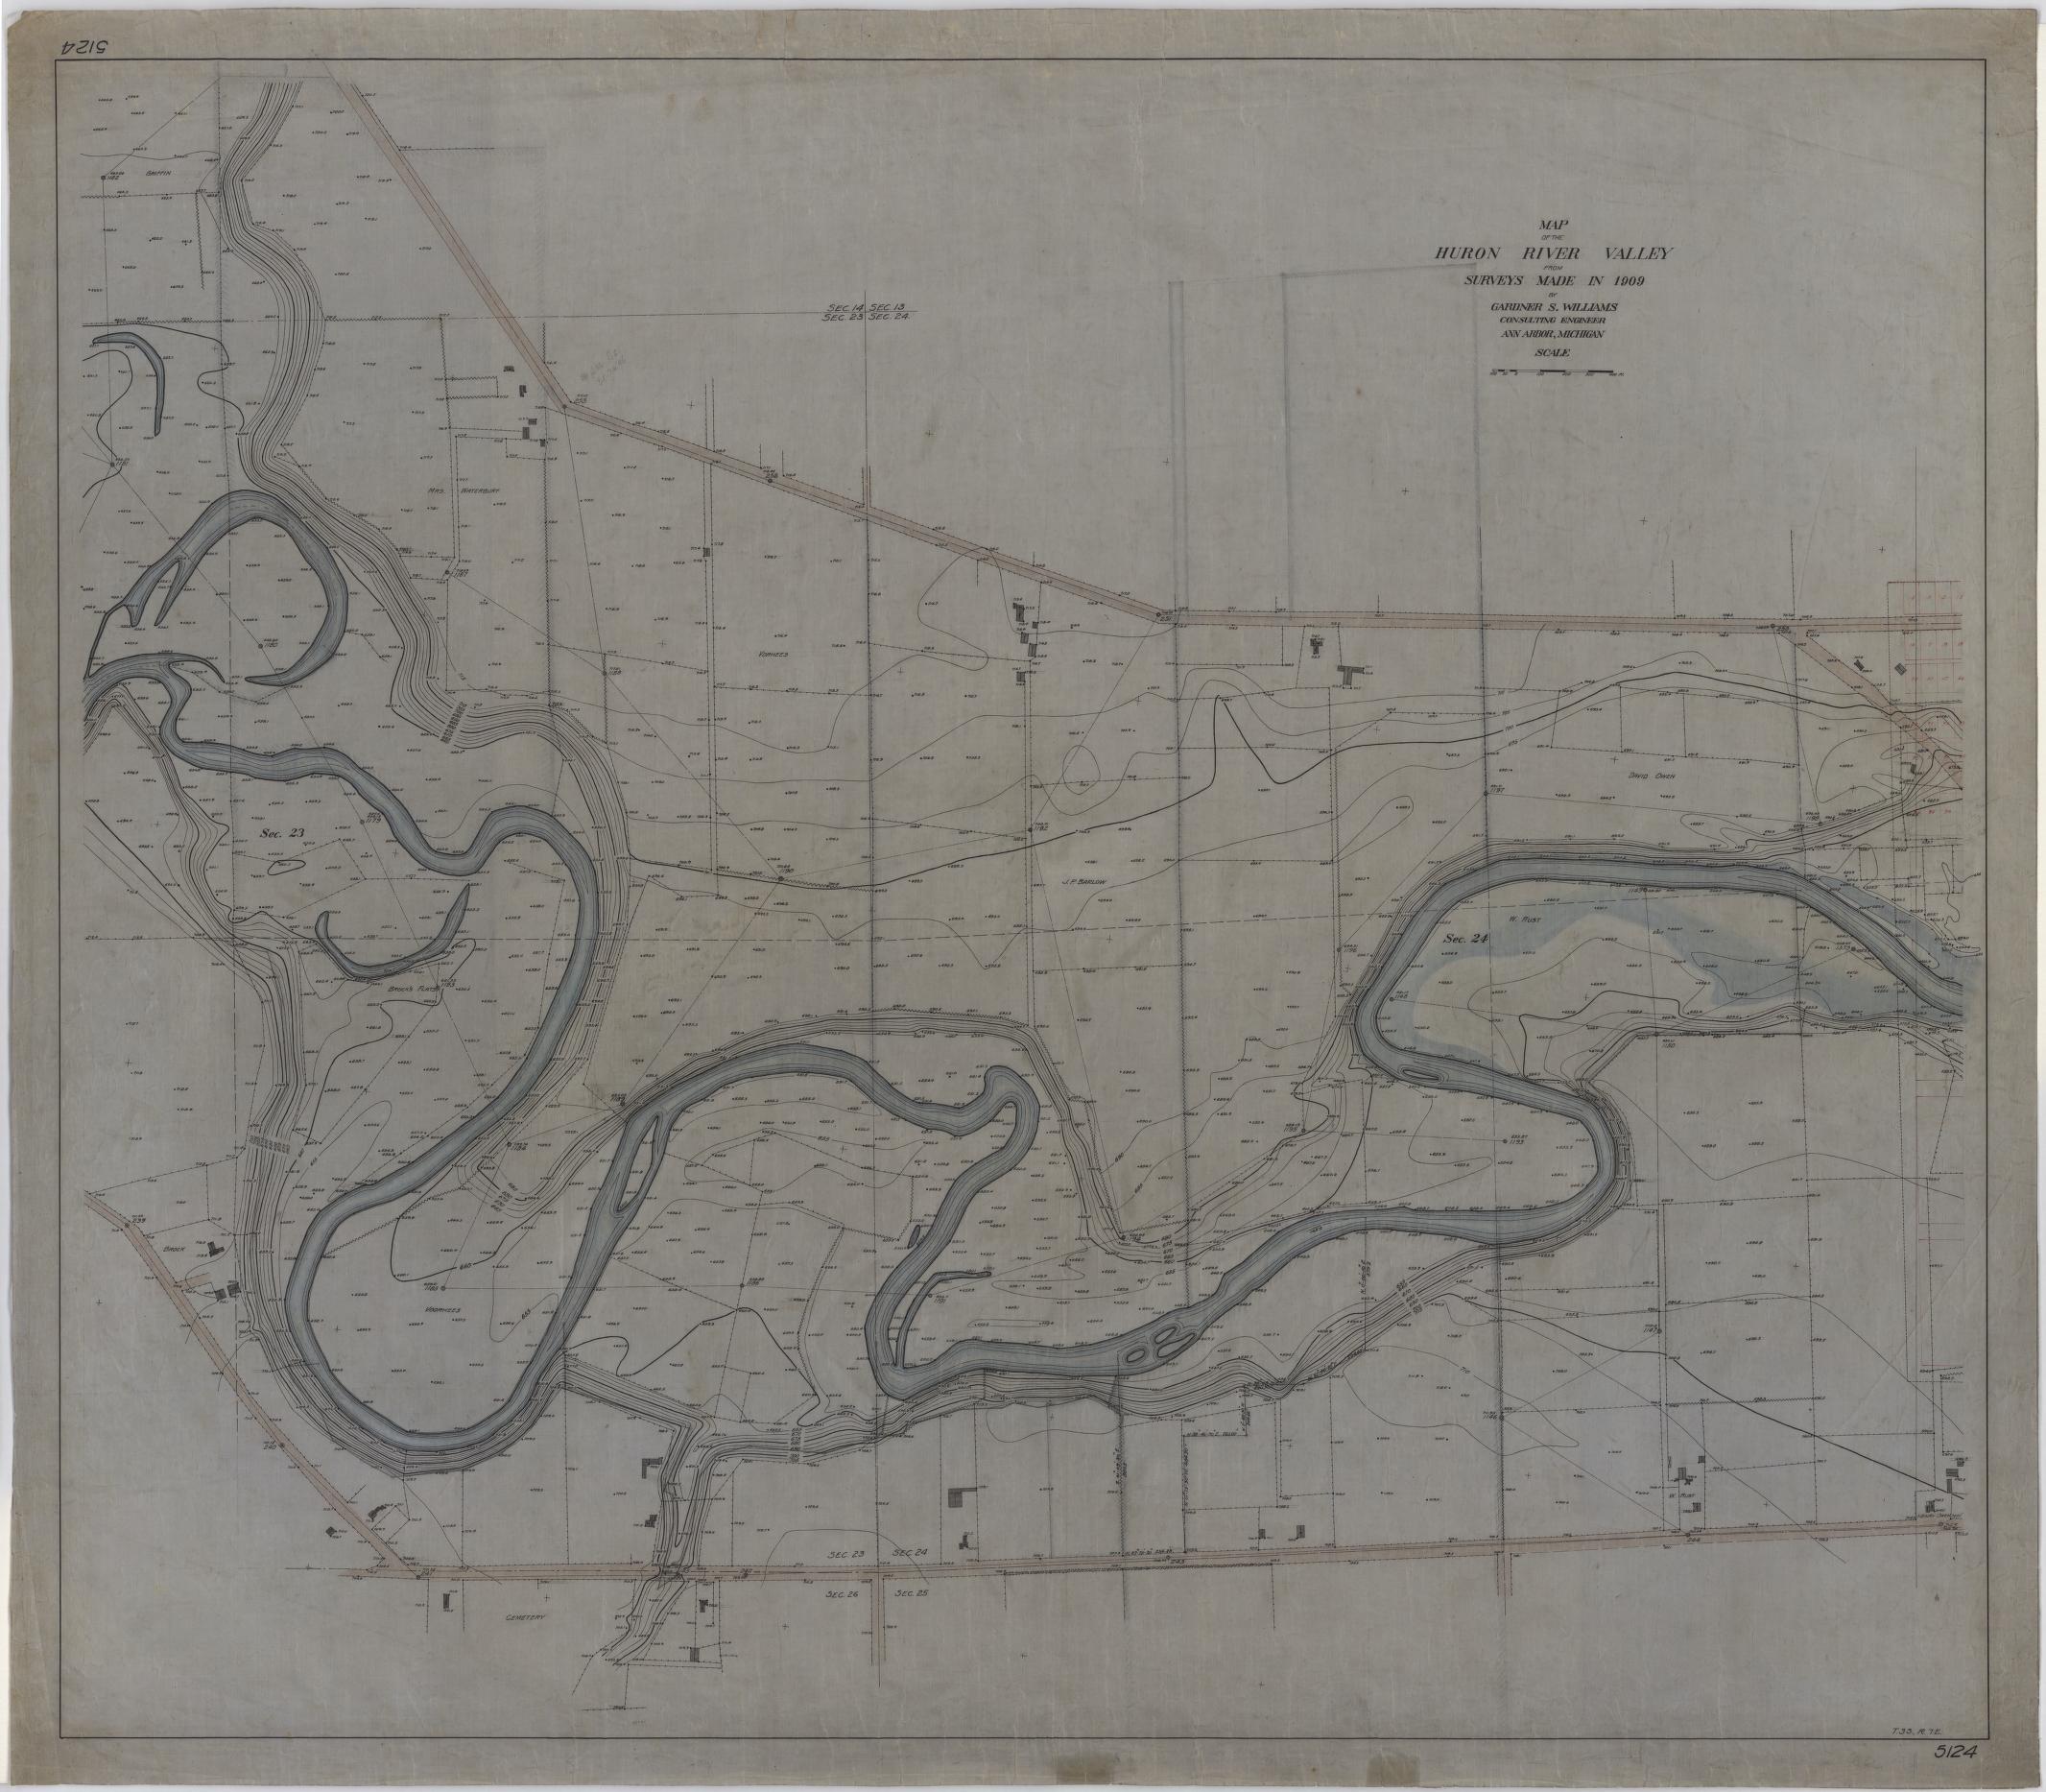 Bentley Image Bank, Bentley Historical Library: Map of the